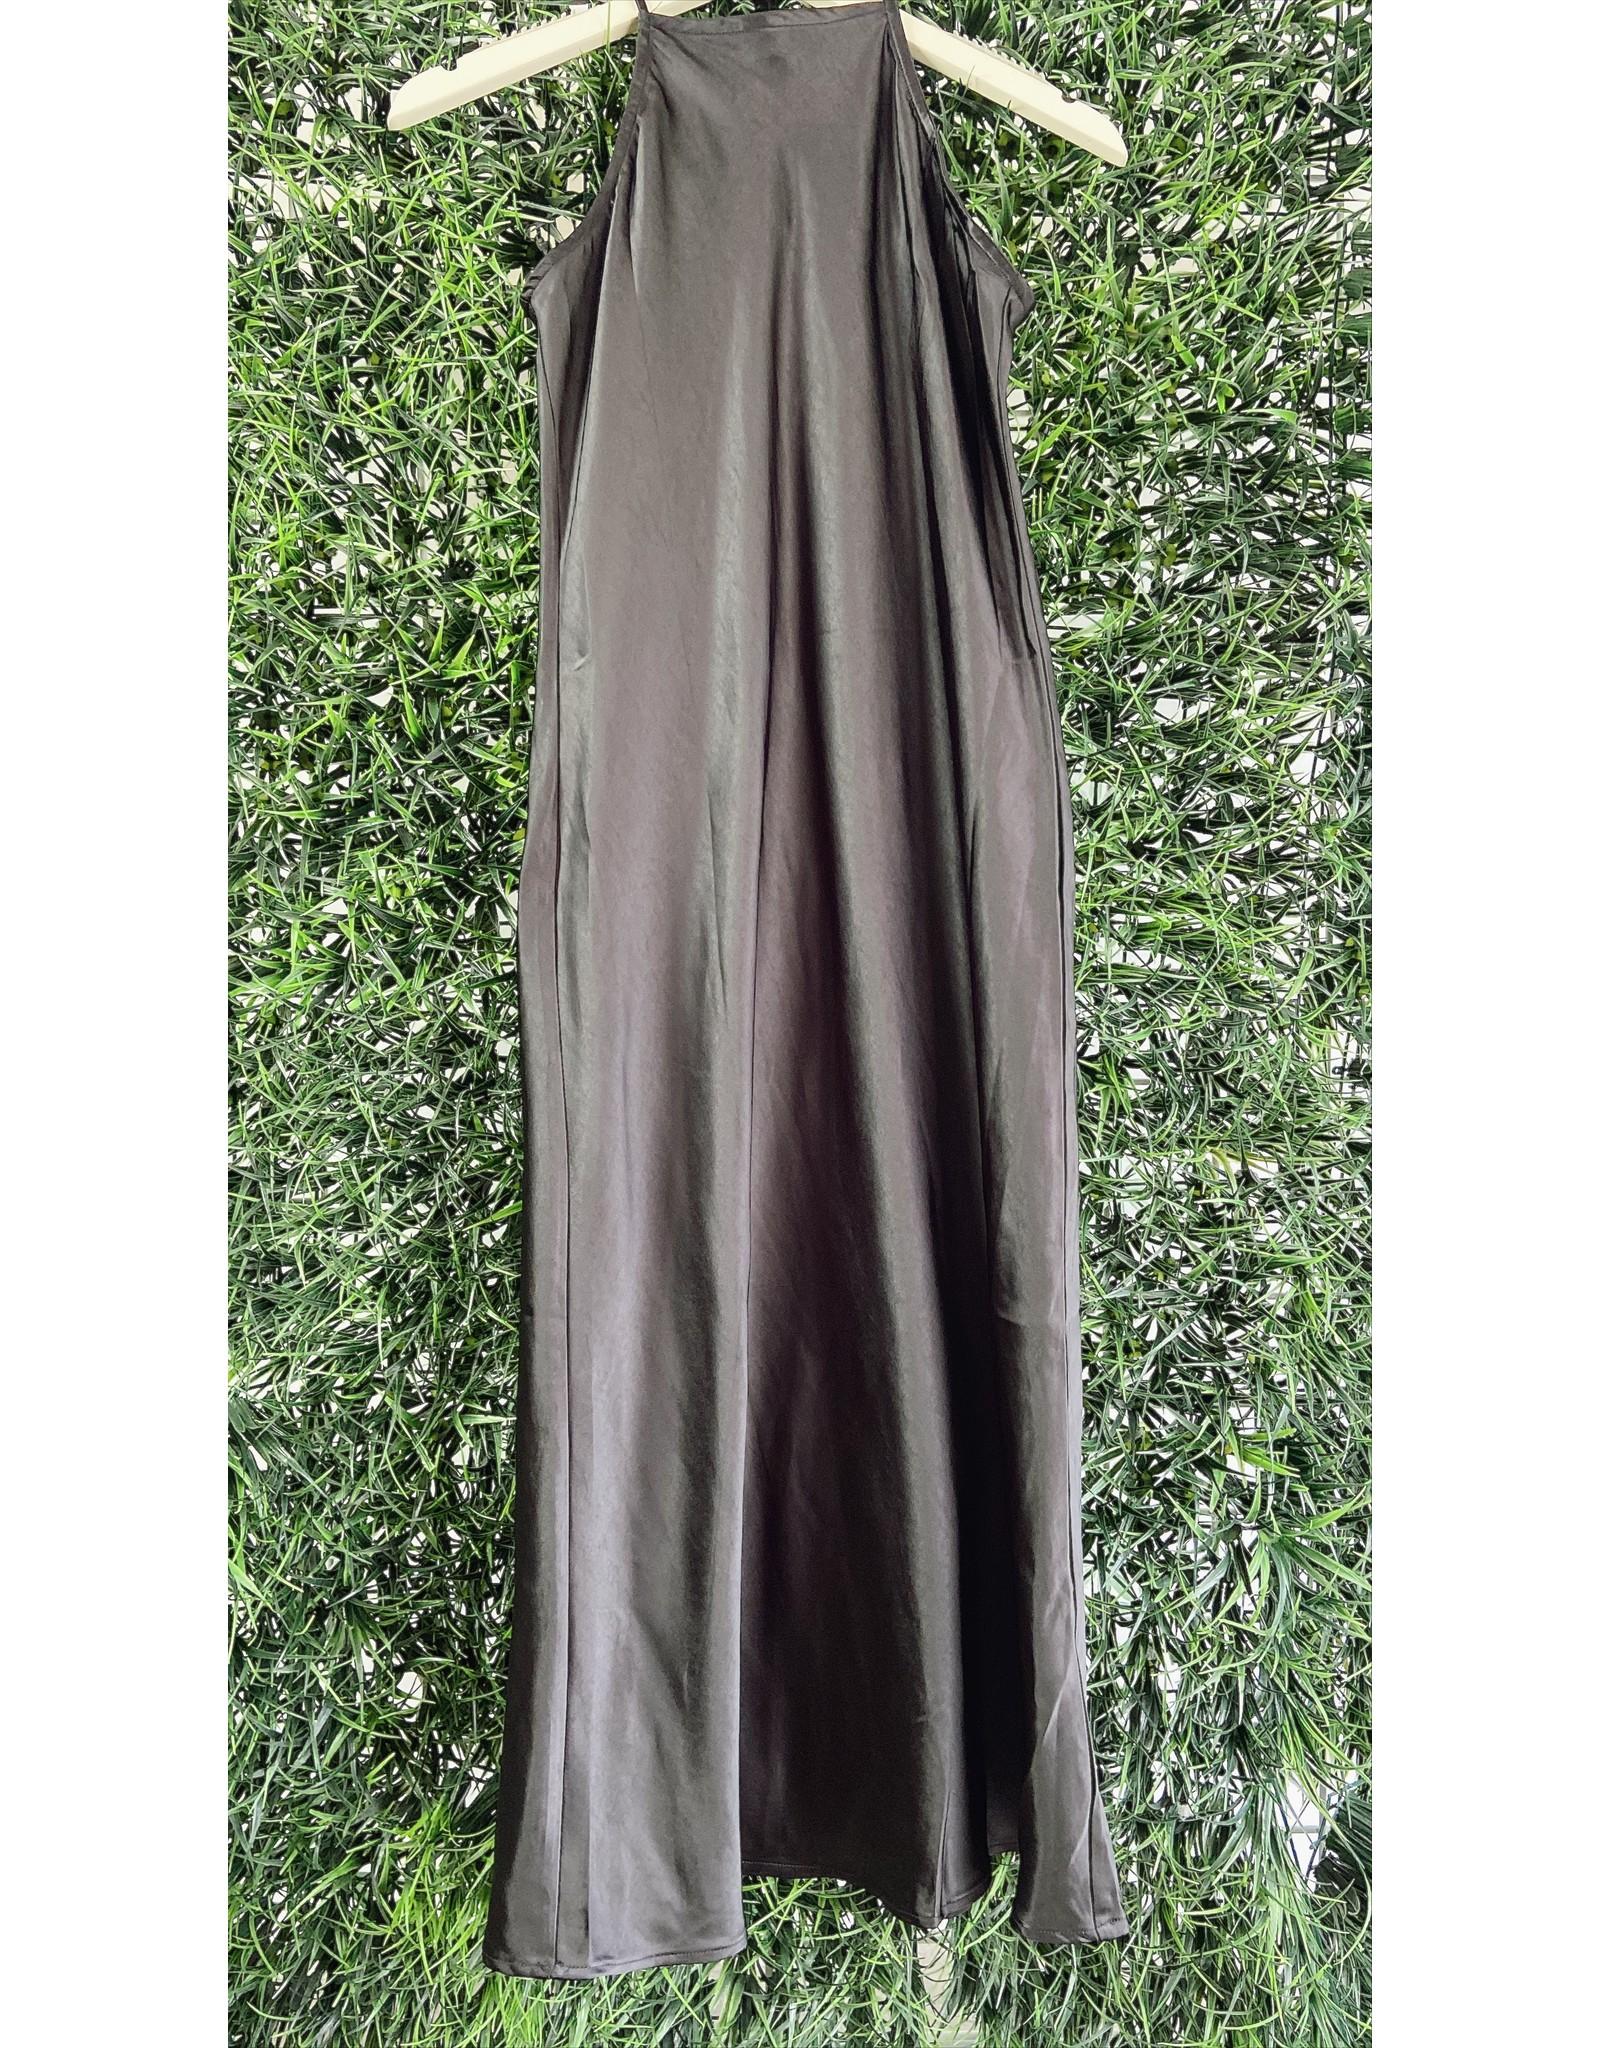 KIRAN SLEEVELESS DRESS